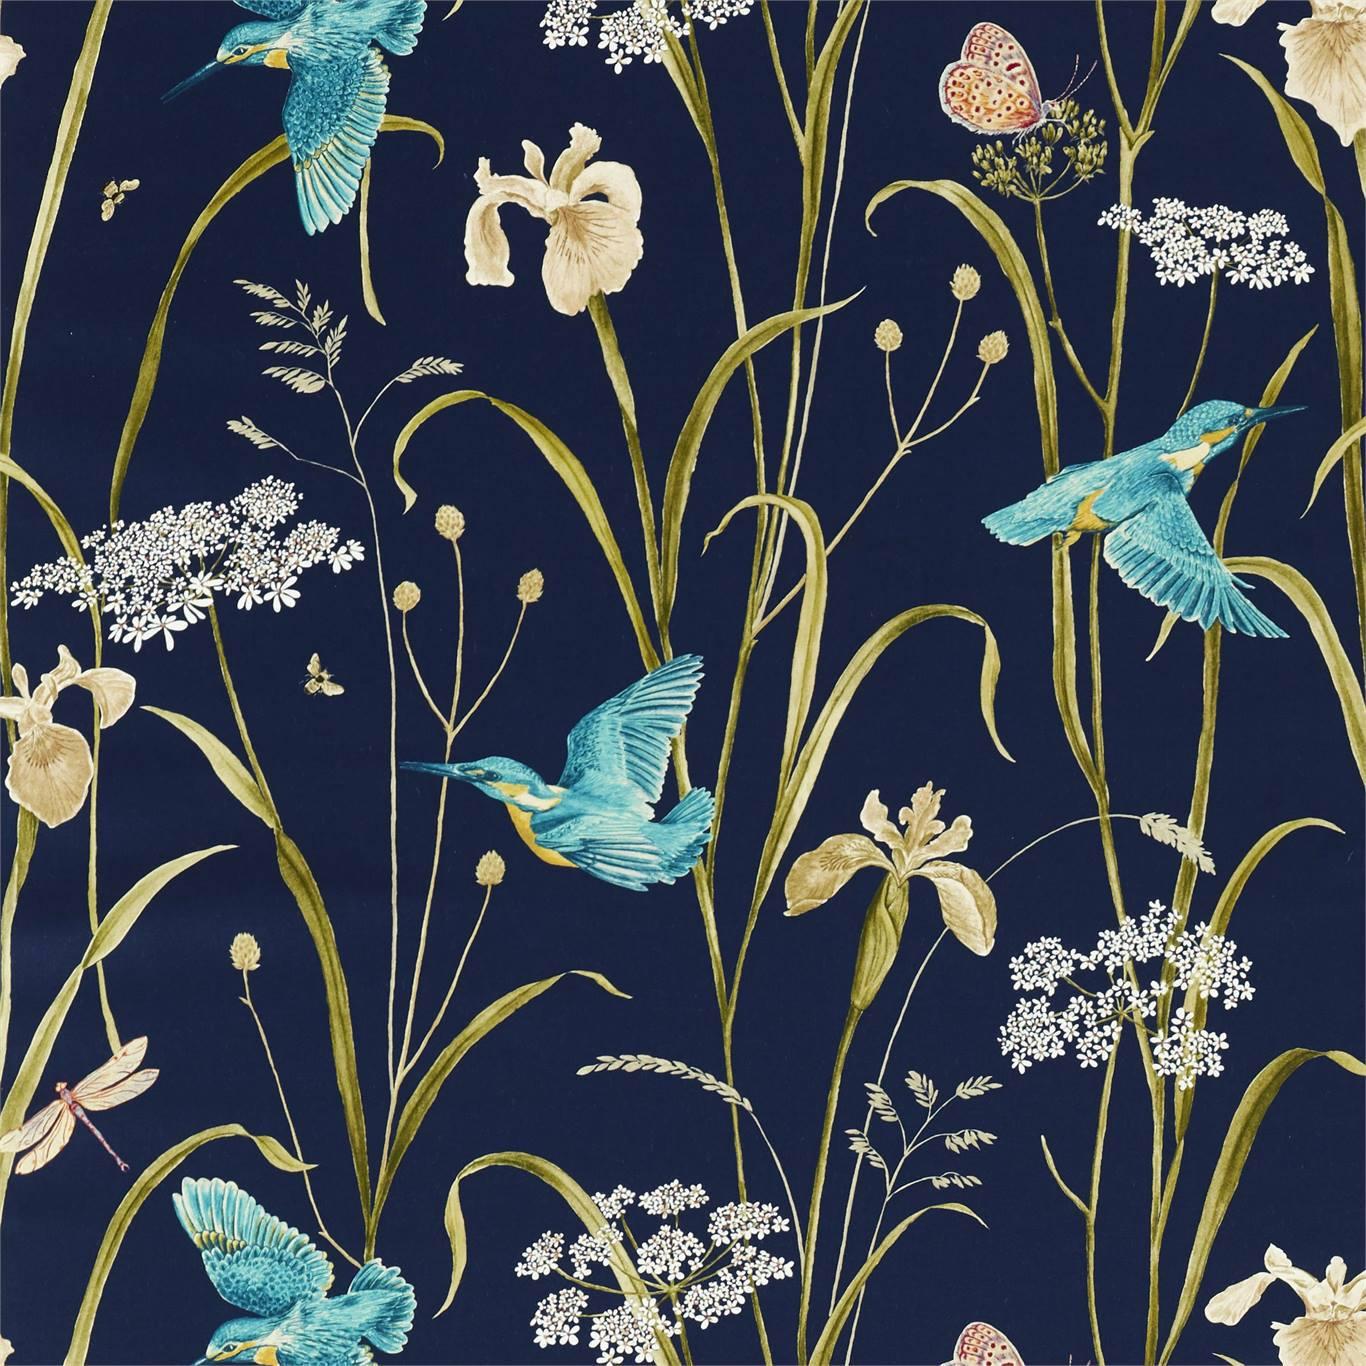 Kingfisher & Iris by SAN